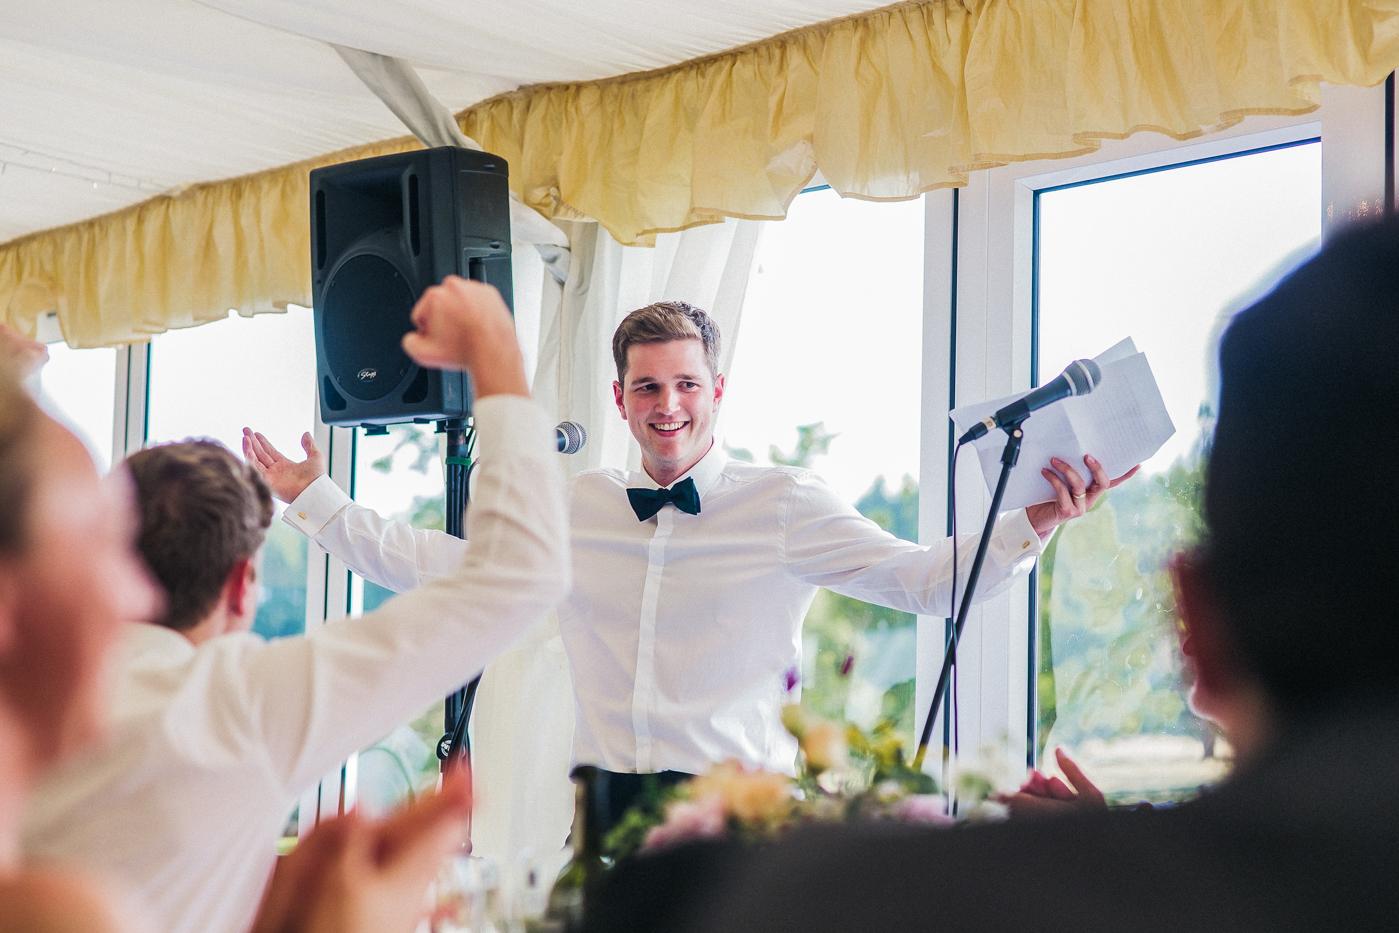 teesside-middlesbrough-north-east-wedding-photographer-creative-wedding-venues-0035.jpg